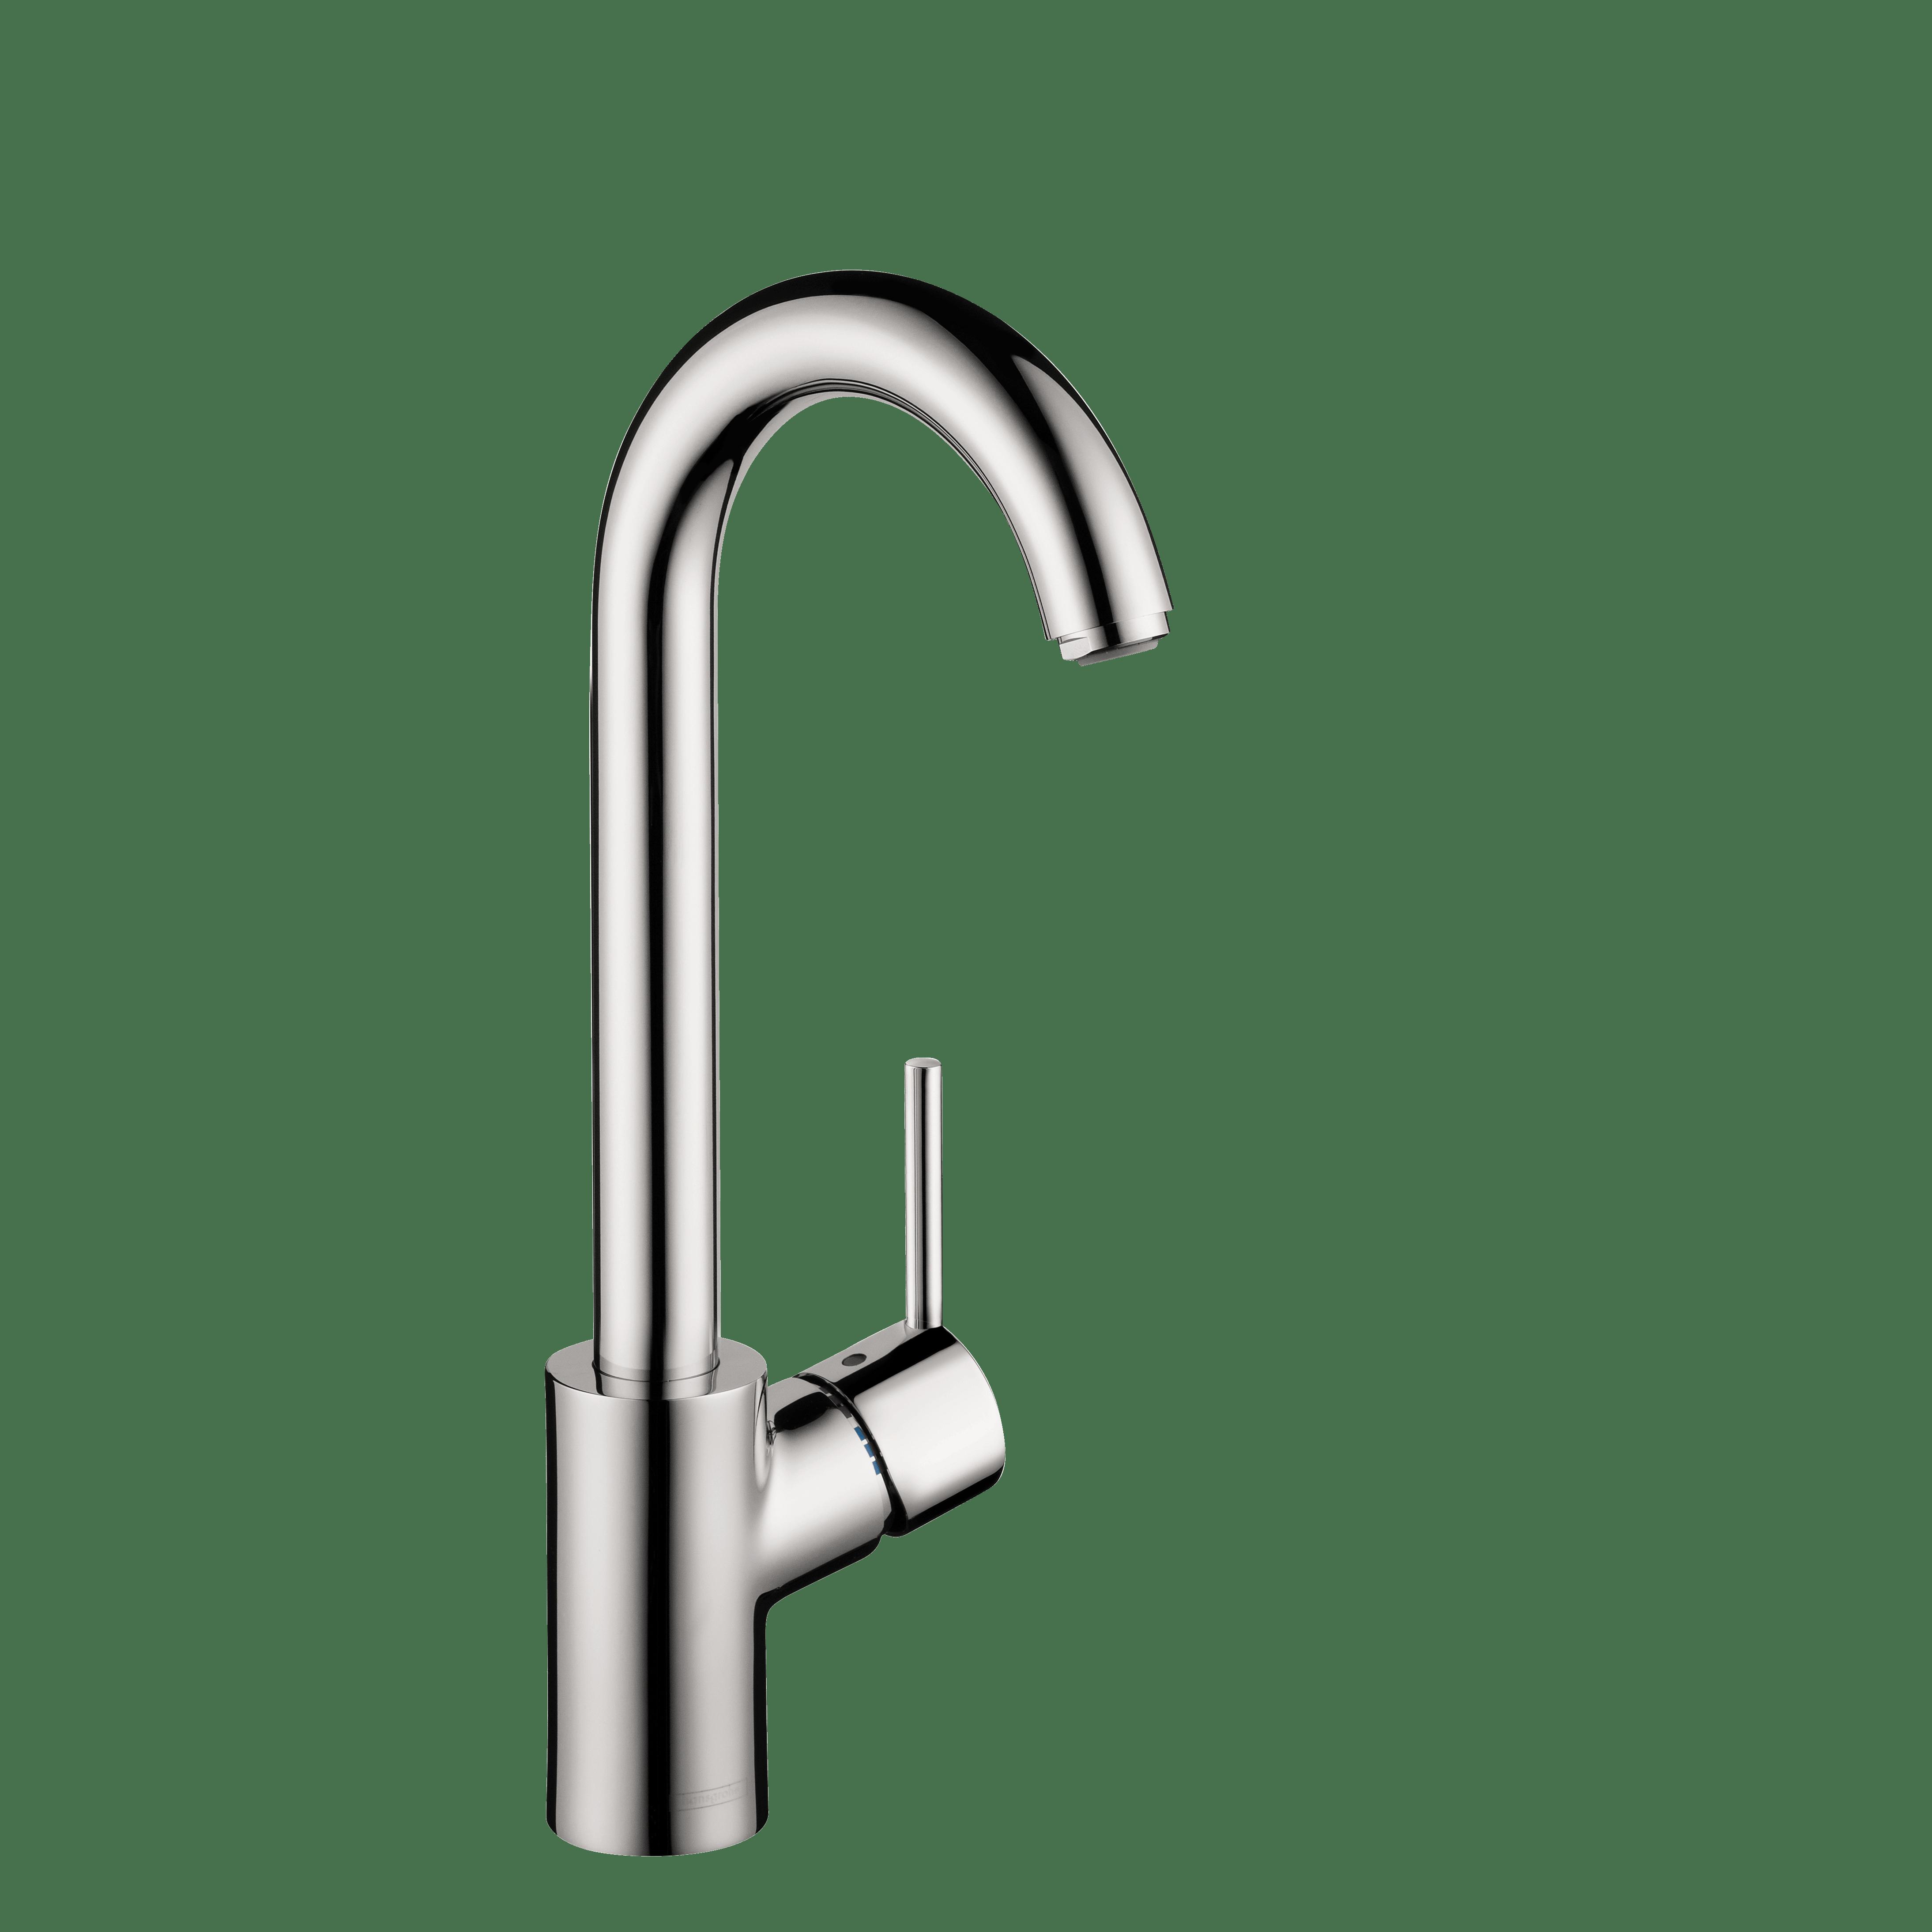 Hansgrohe 04287 Talis S Bar Faucet | QualityBath.com